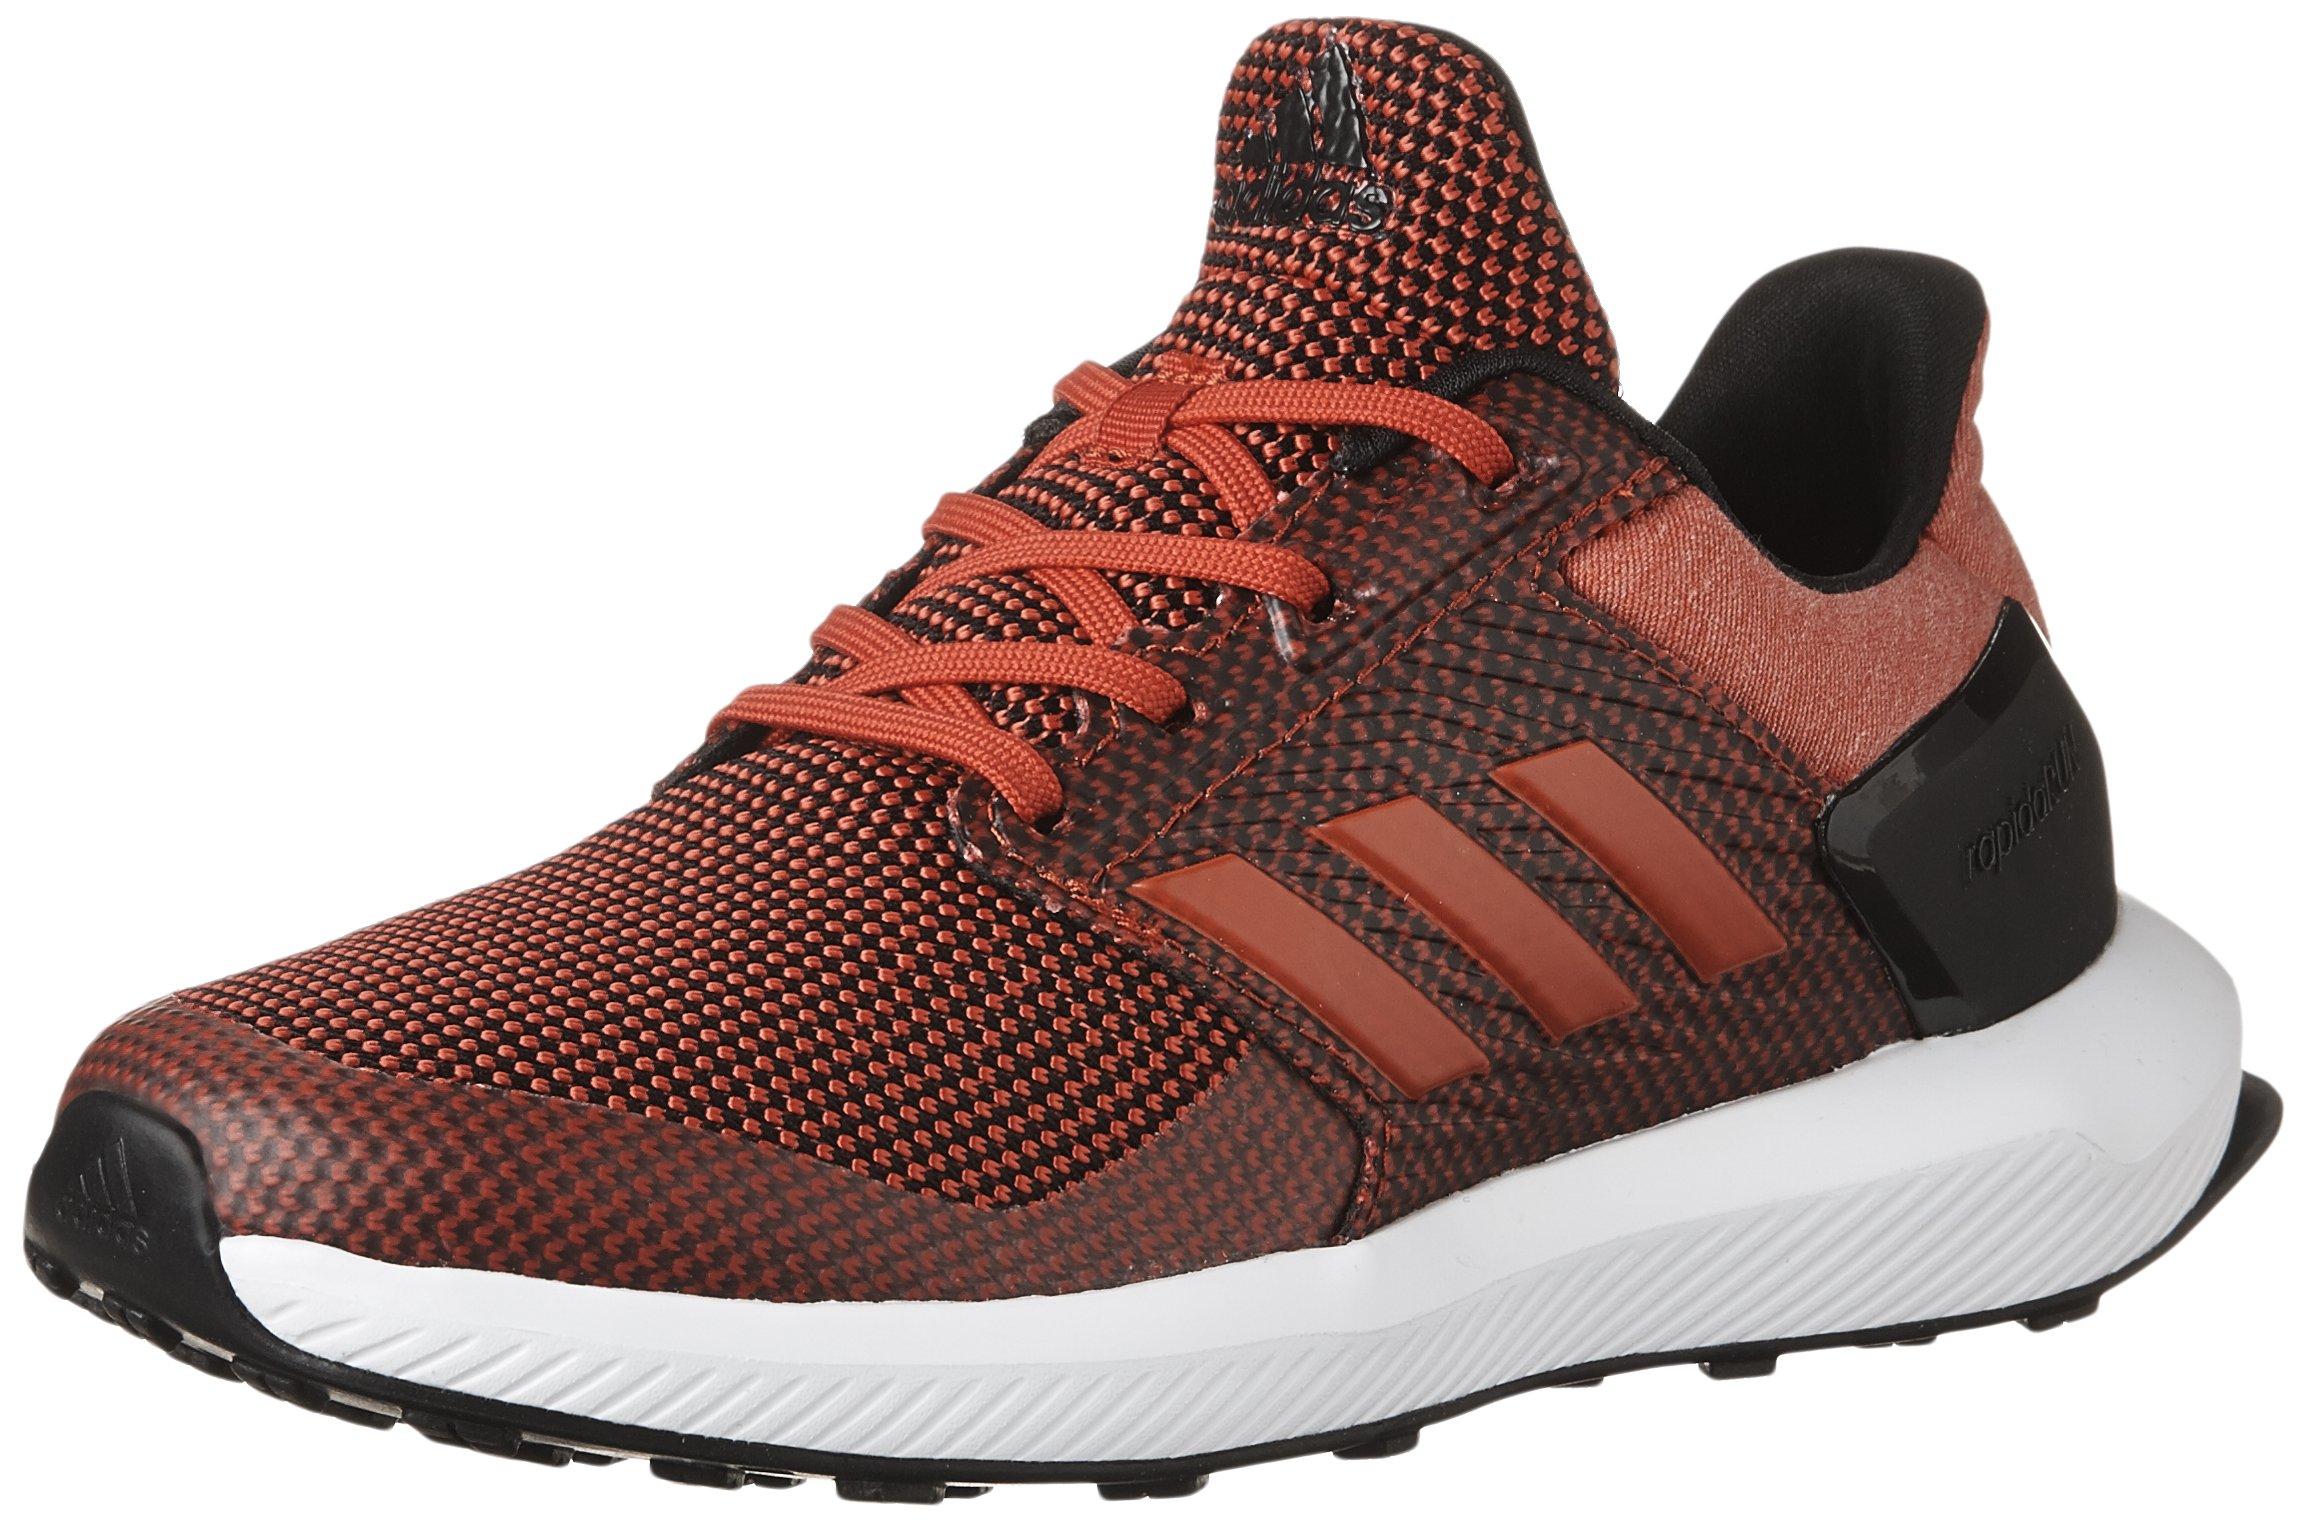 abd9cc050fa4 Galleon - Adidas Boys  RapidaRun Running Shoe